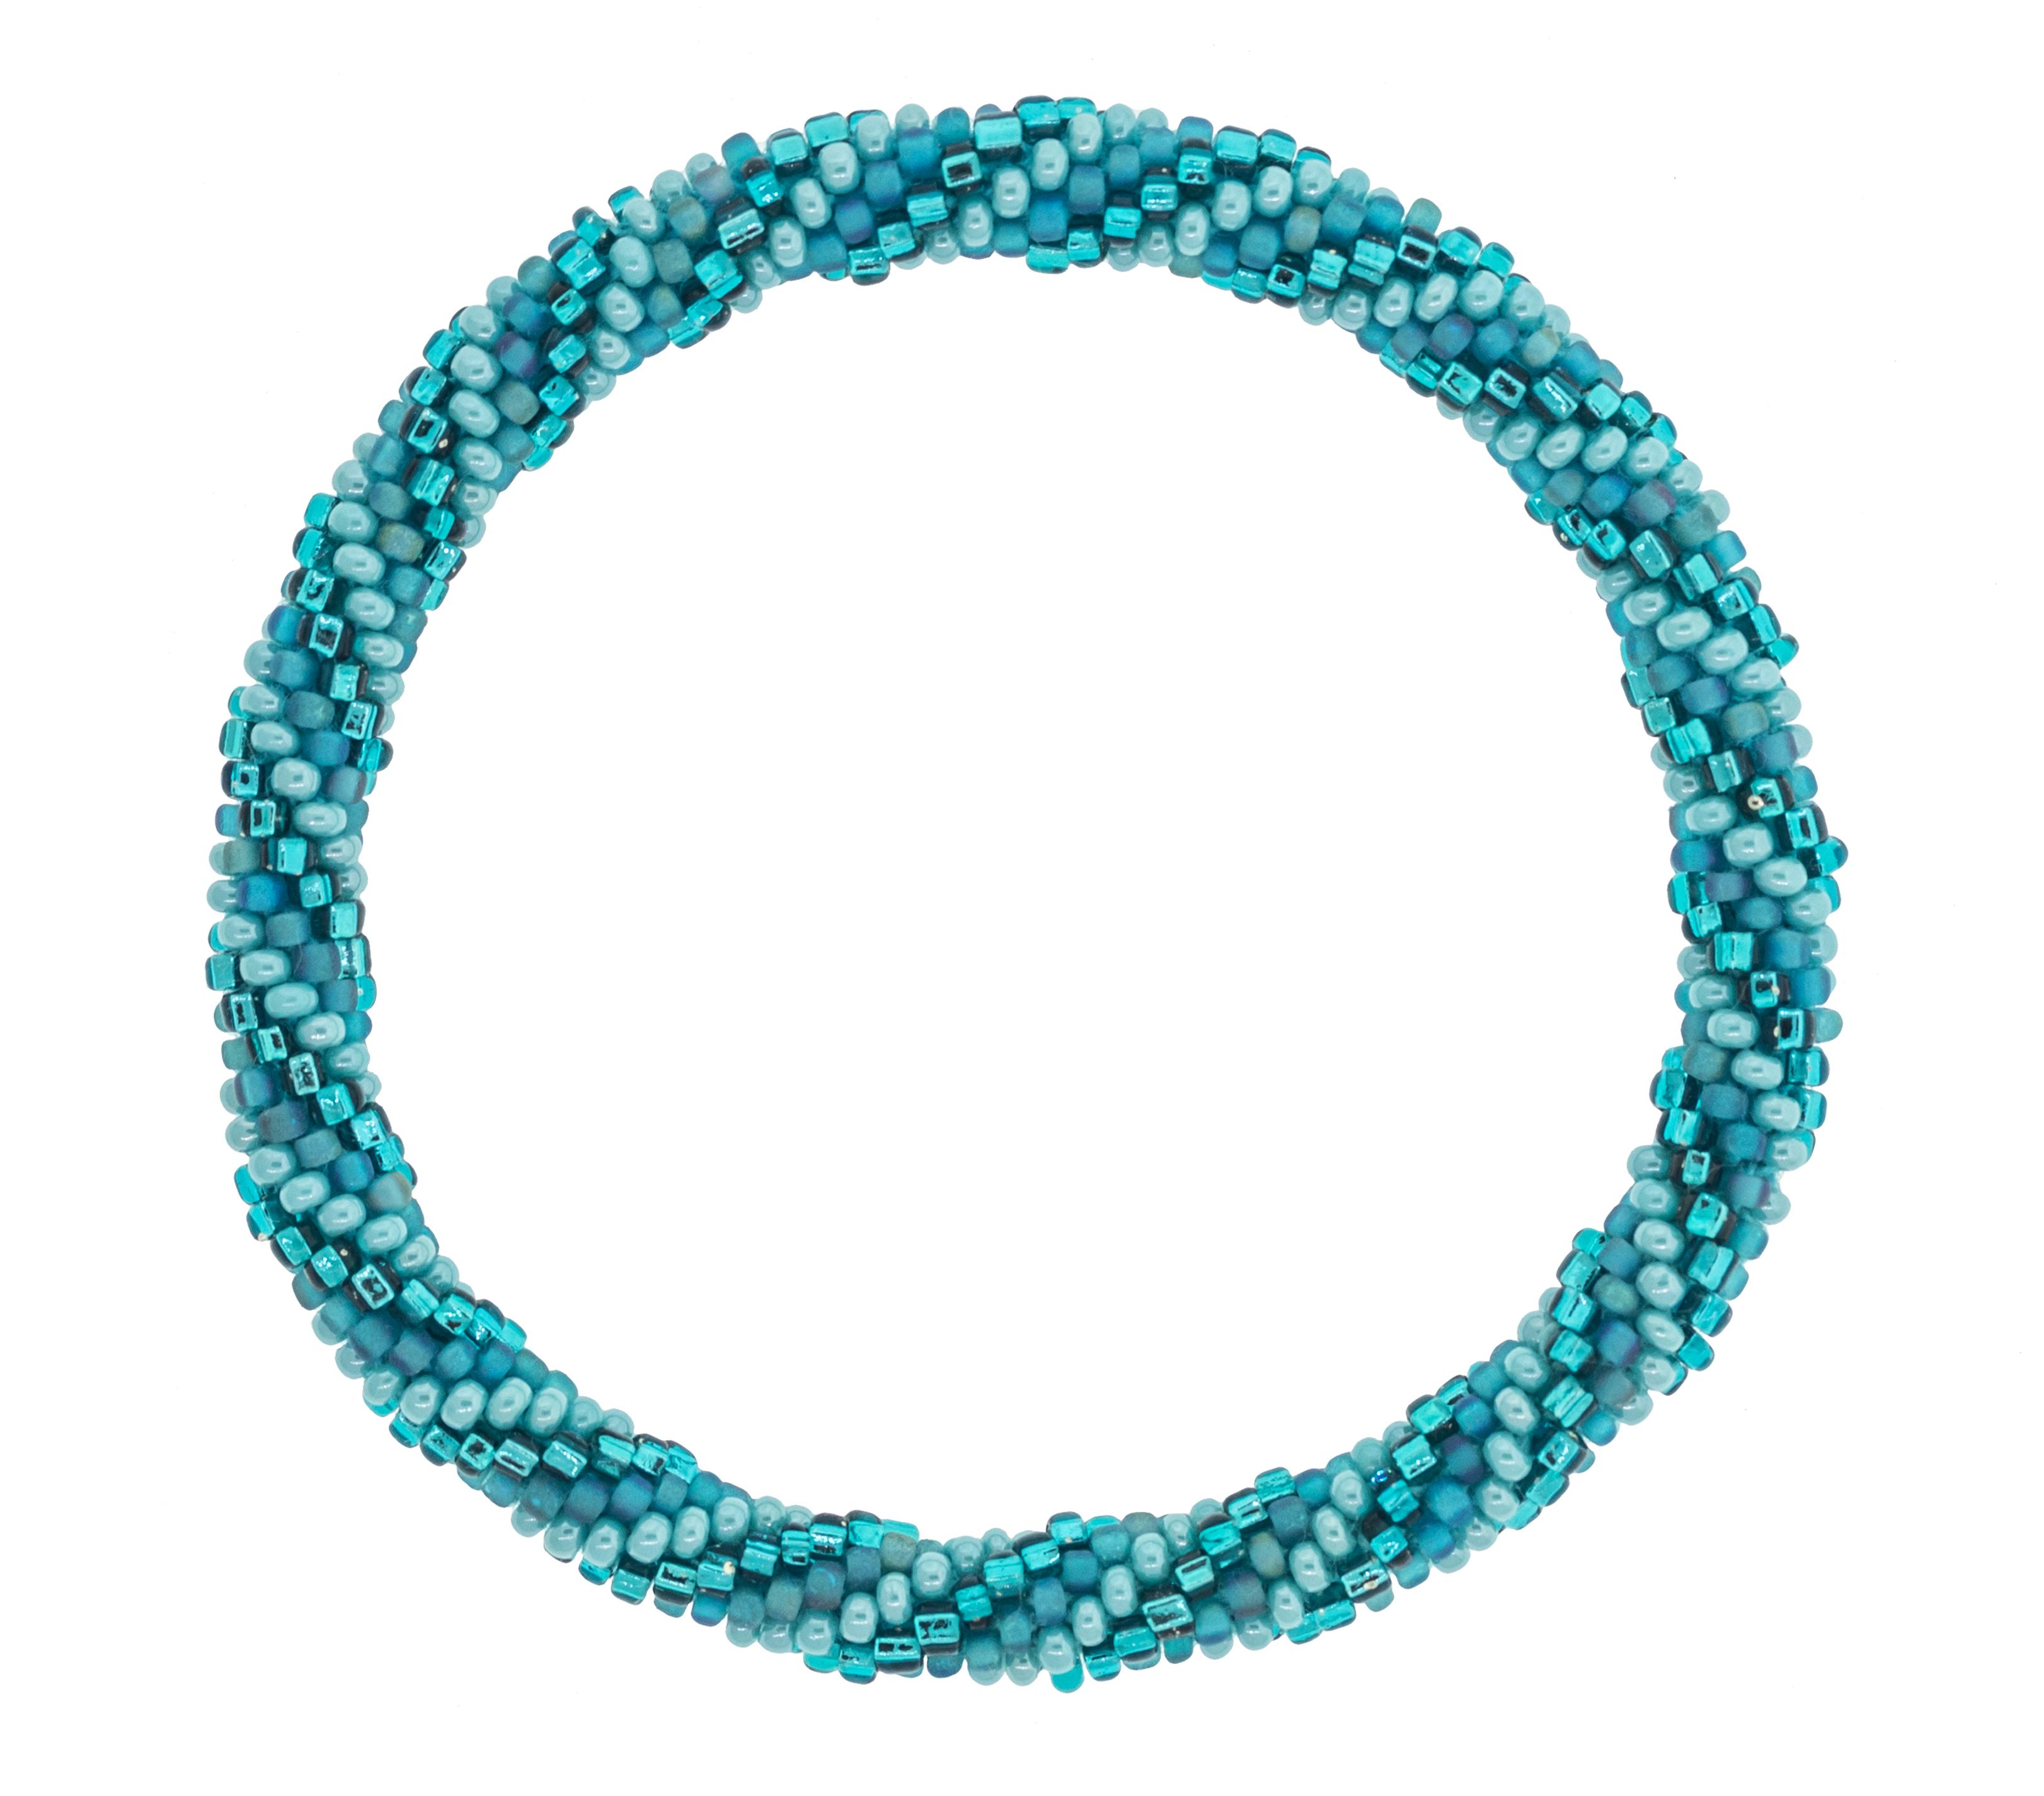 8 Quot Roll On Bracelet Vamos A La Playa Sustainable Jobs Women Artisans Bracelets